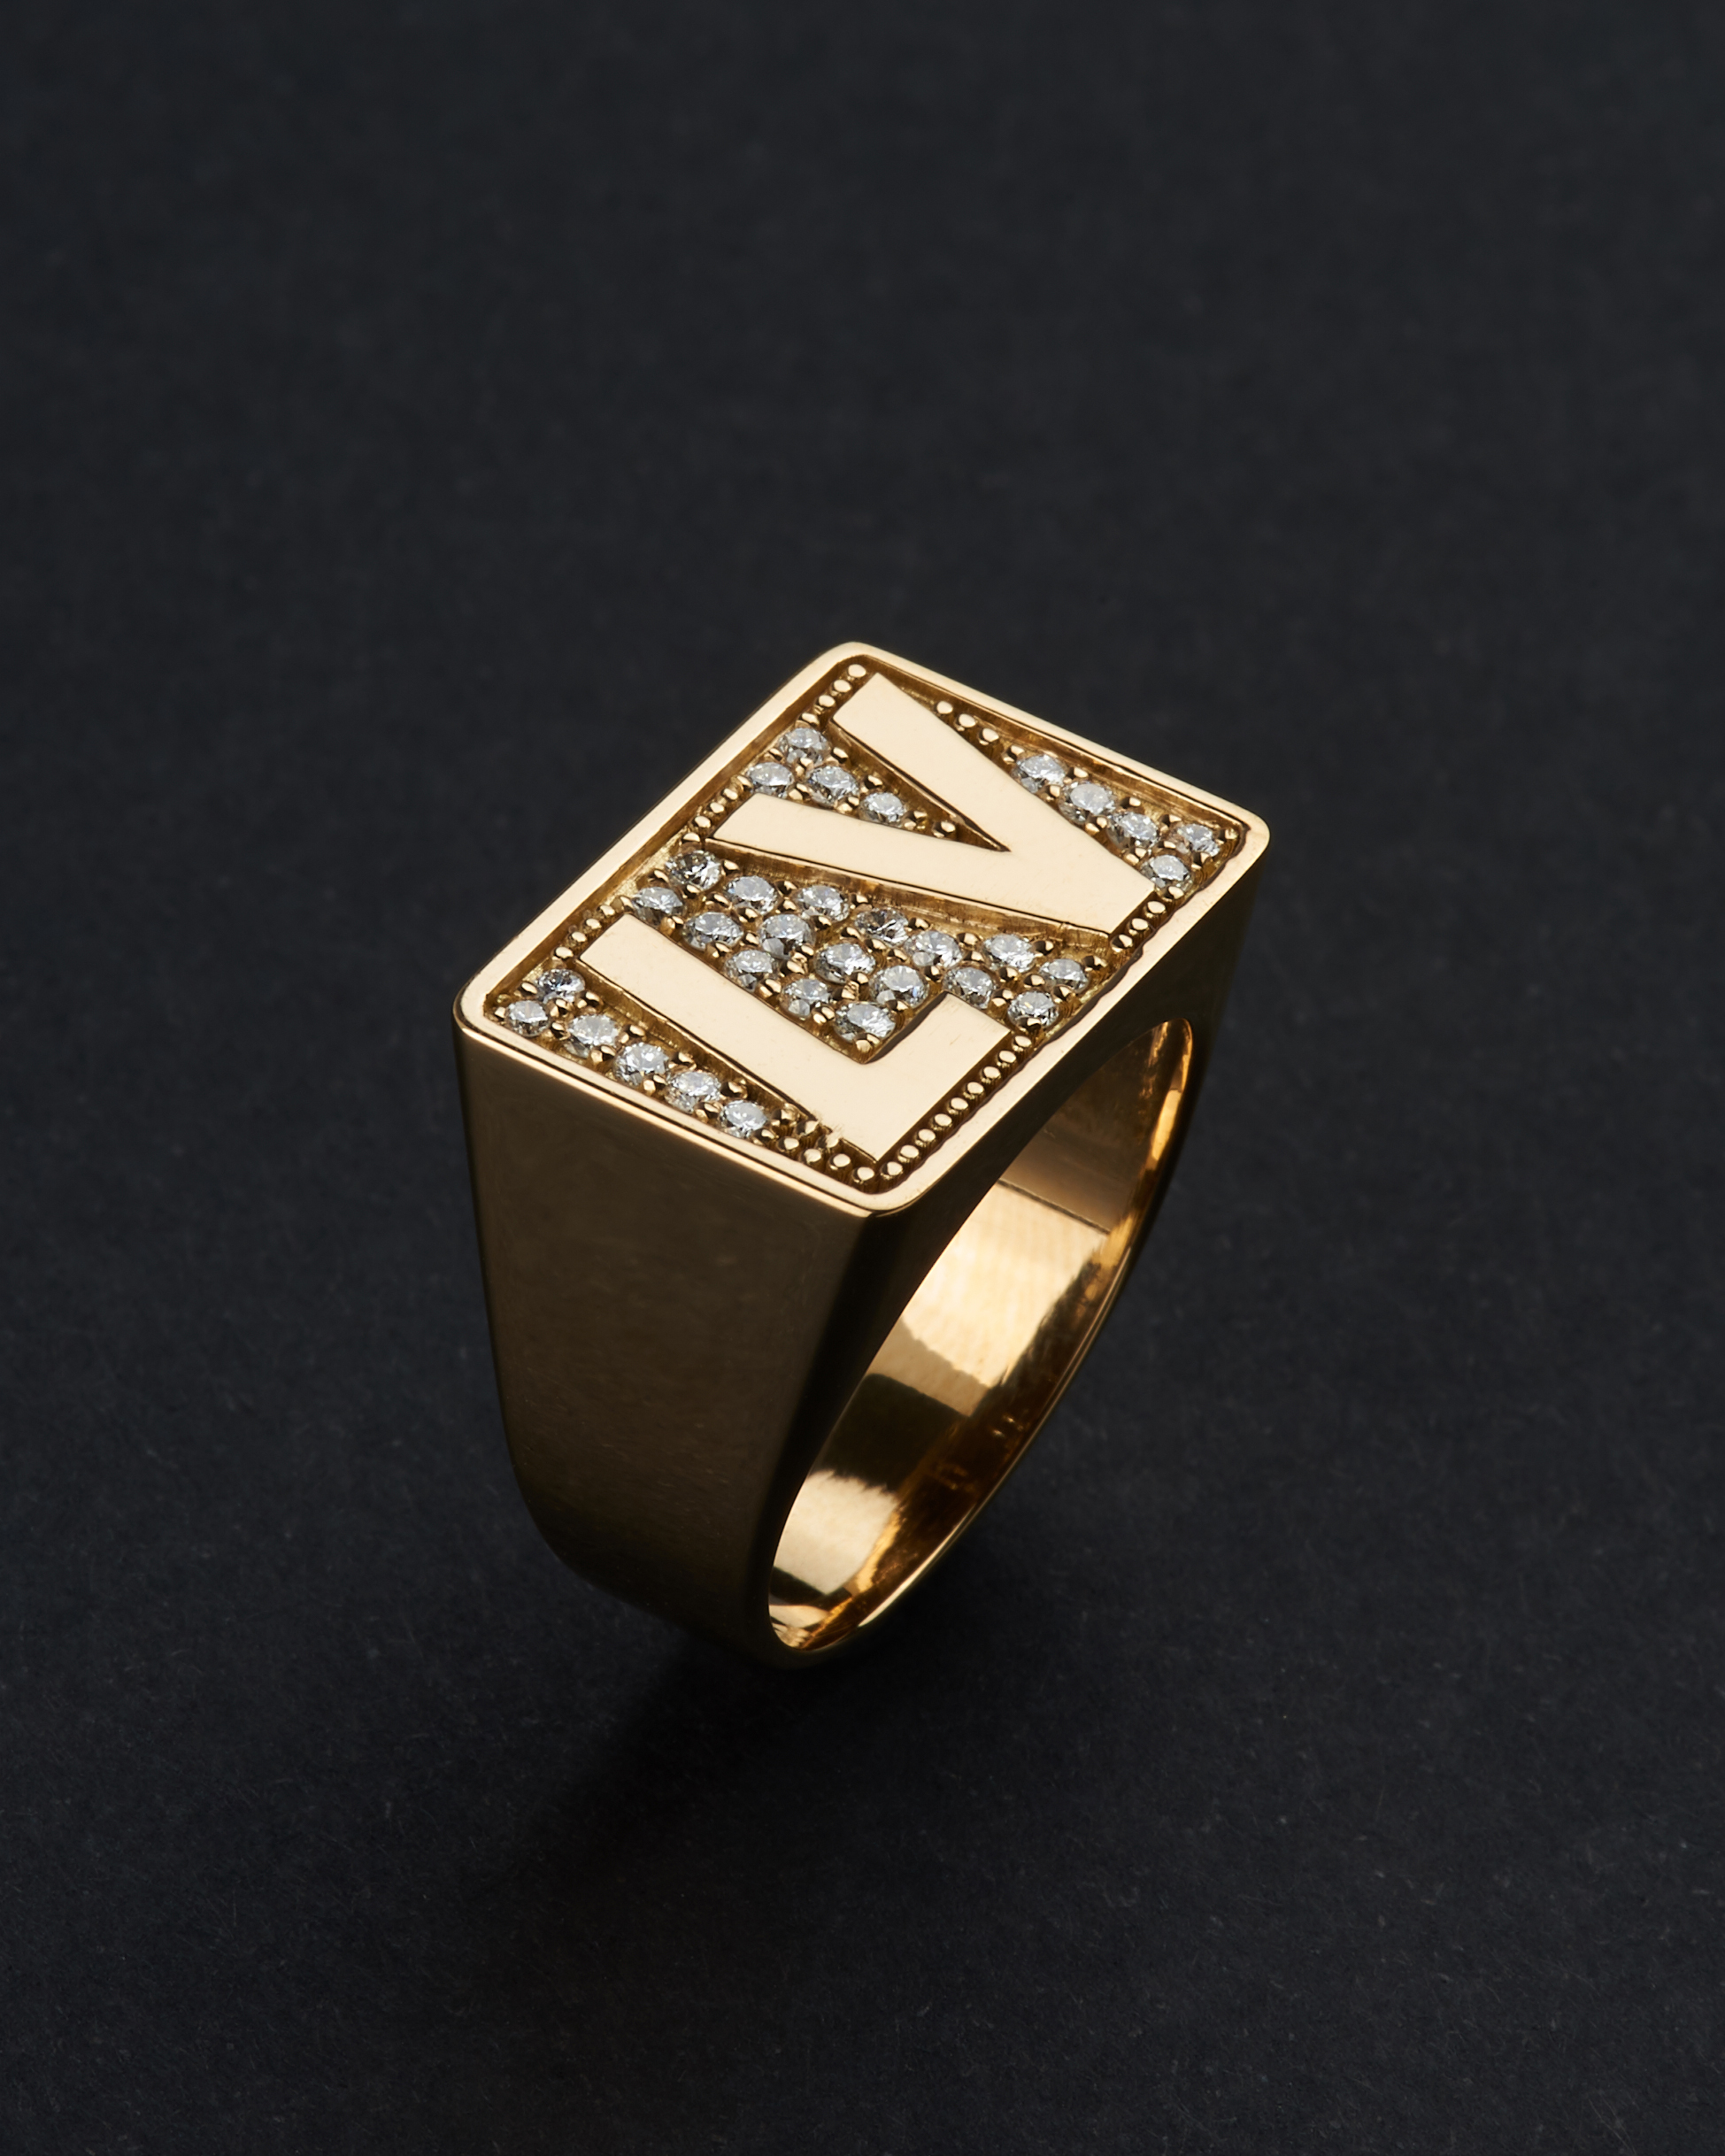 GOLD 18K & DIAMONDS